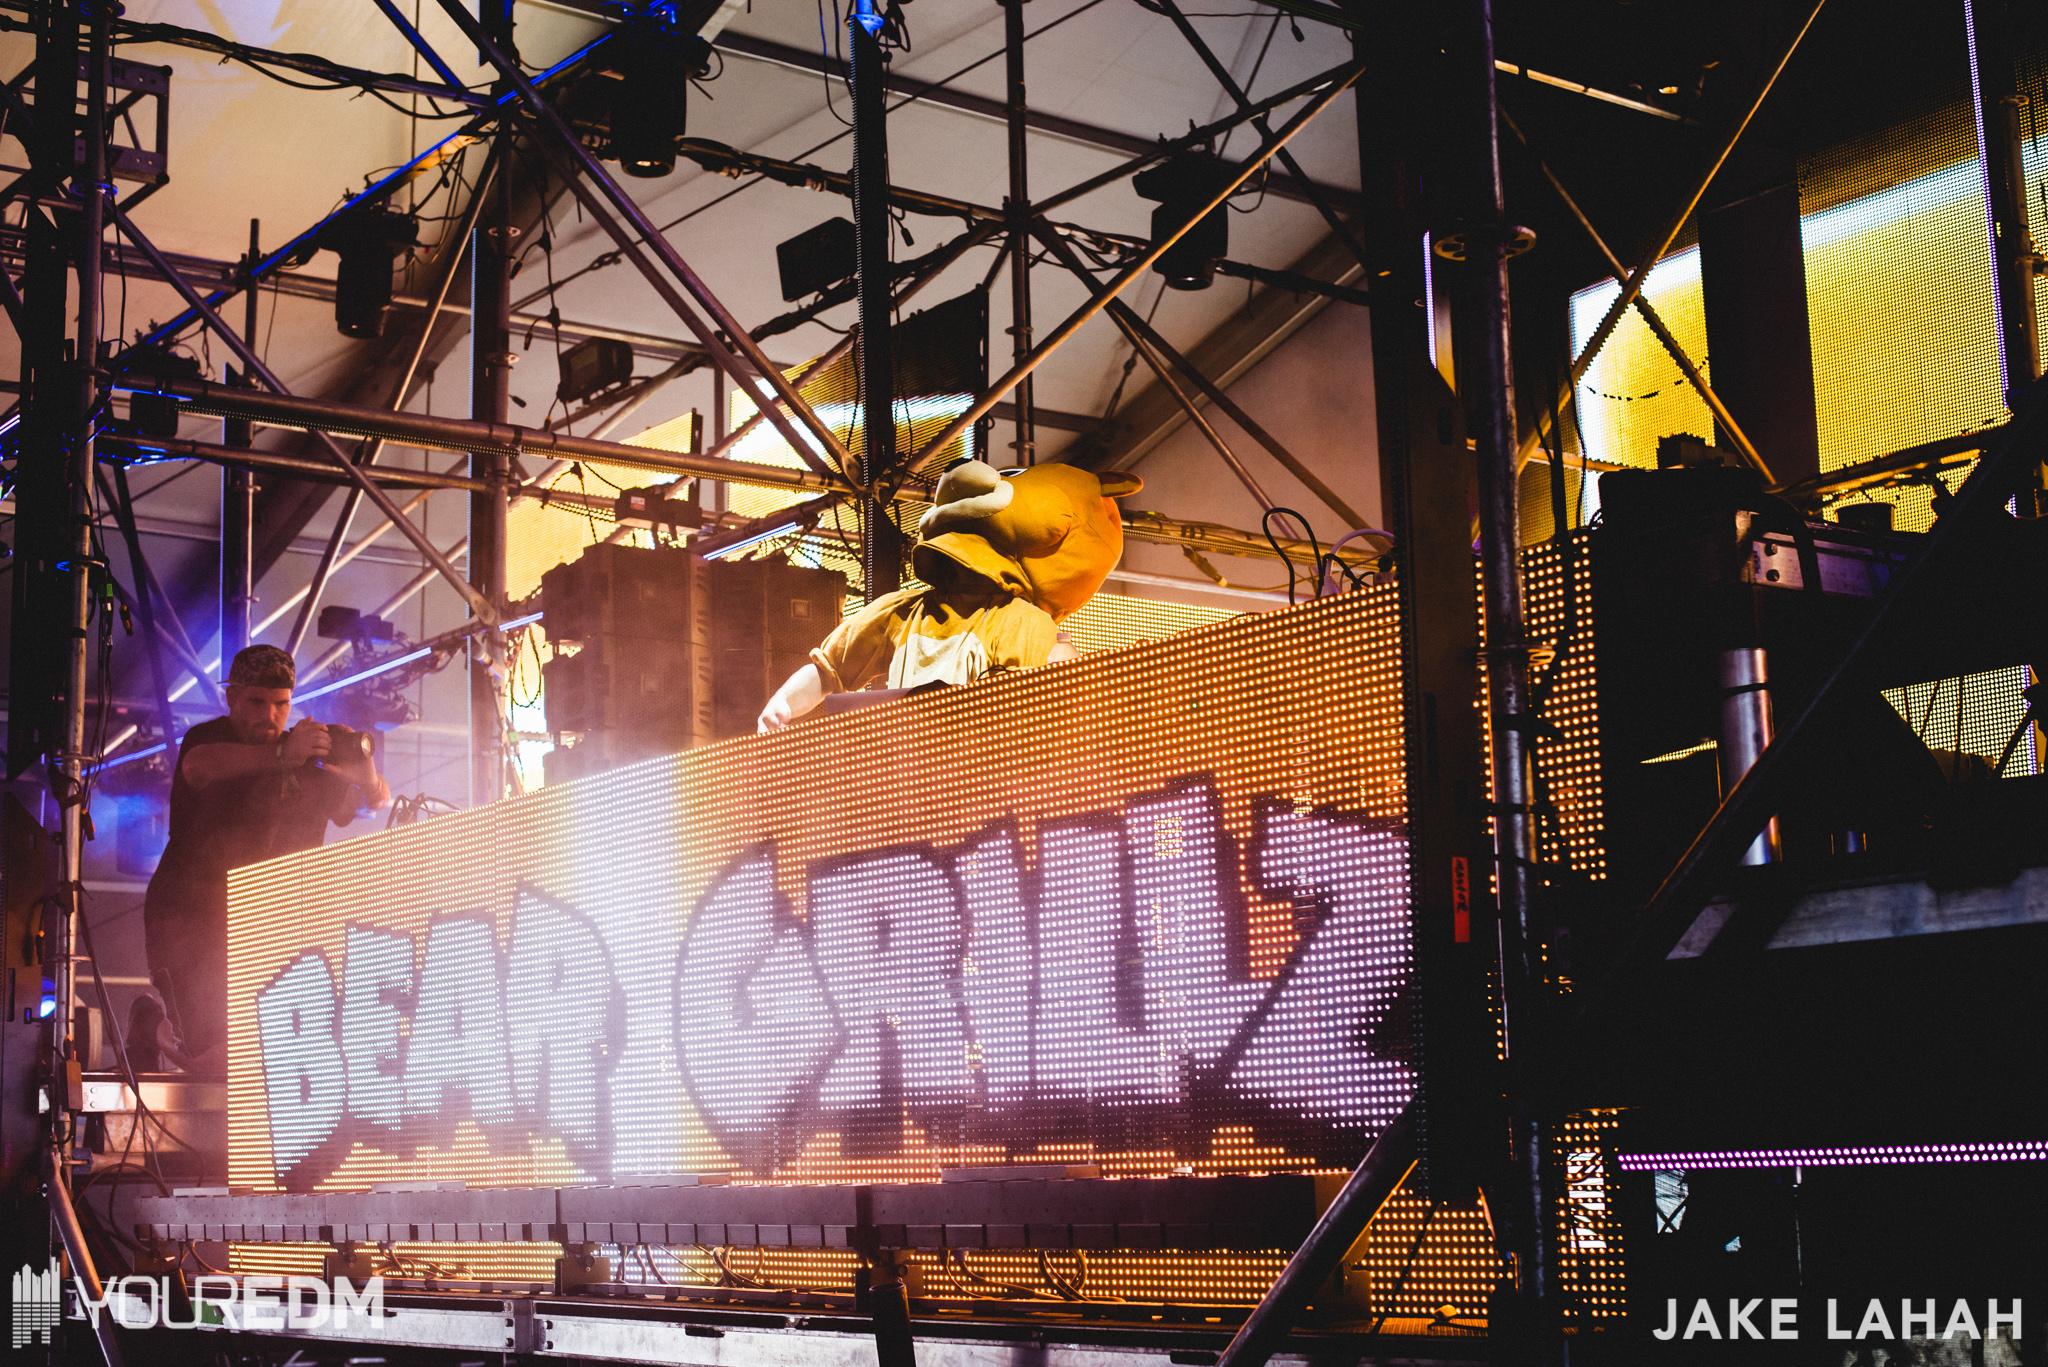 bear-grillz_28859859505_o